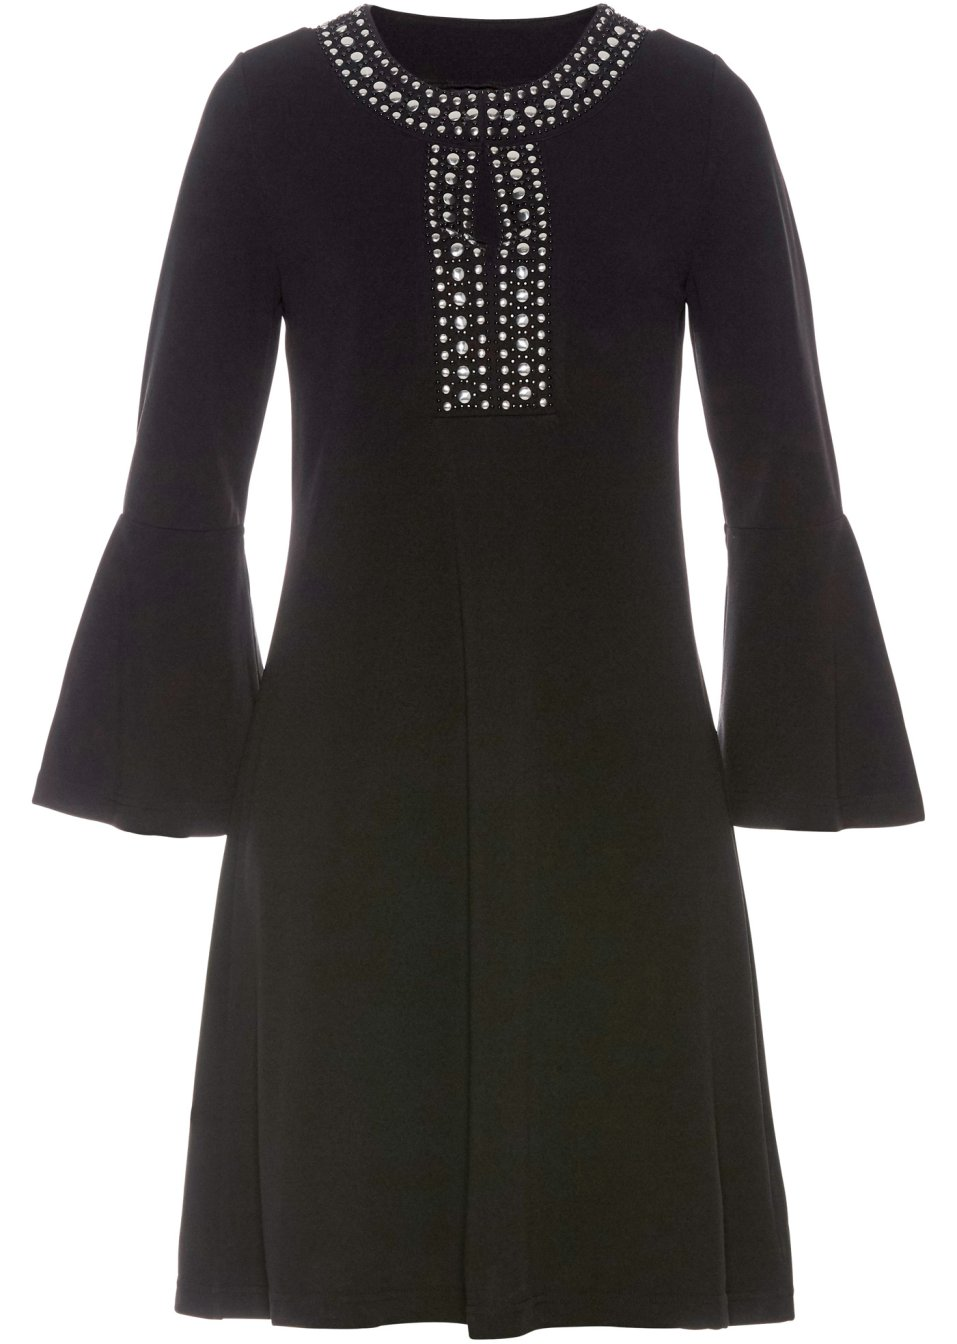 Elegantes Shirt-Tunika-Kleid mit zierender Applikation - schwarz JGKyU W2kn7